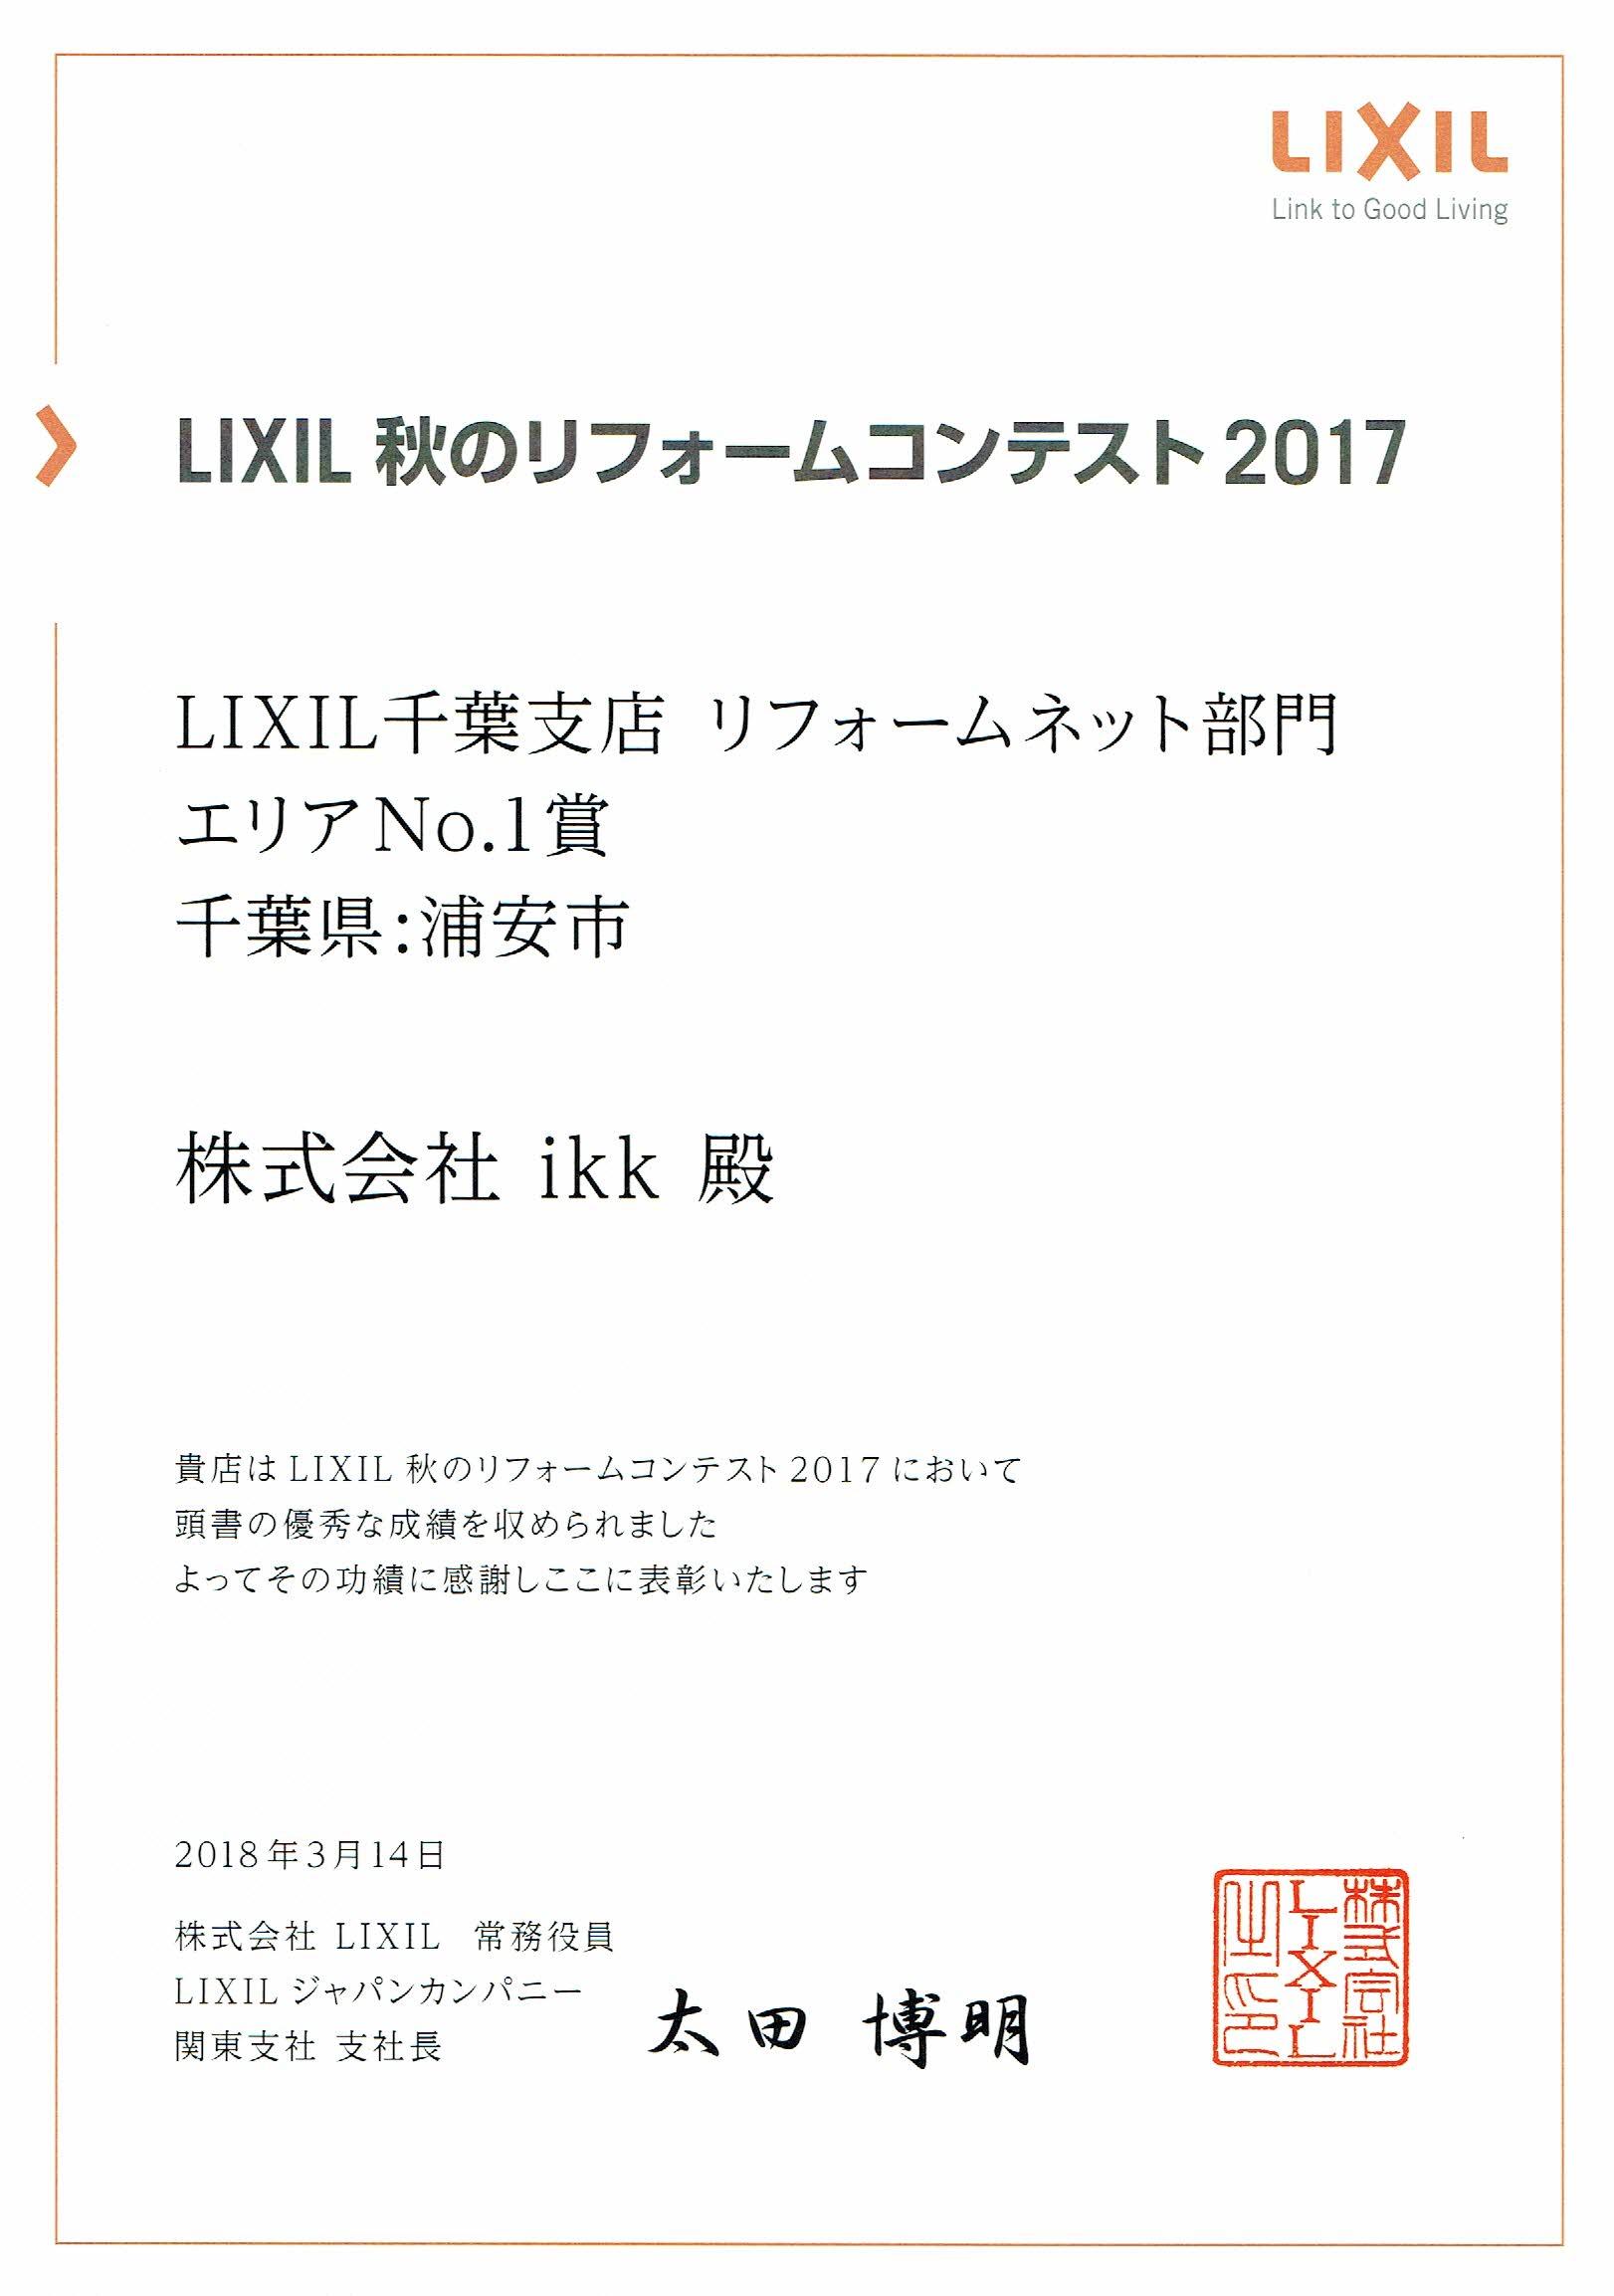 LIXIL秋のリフォームコンテスト